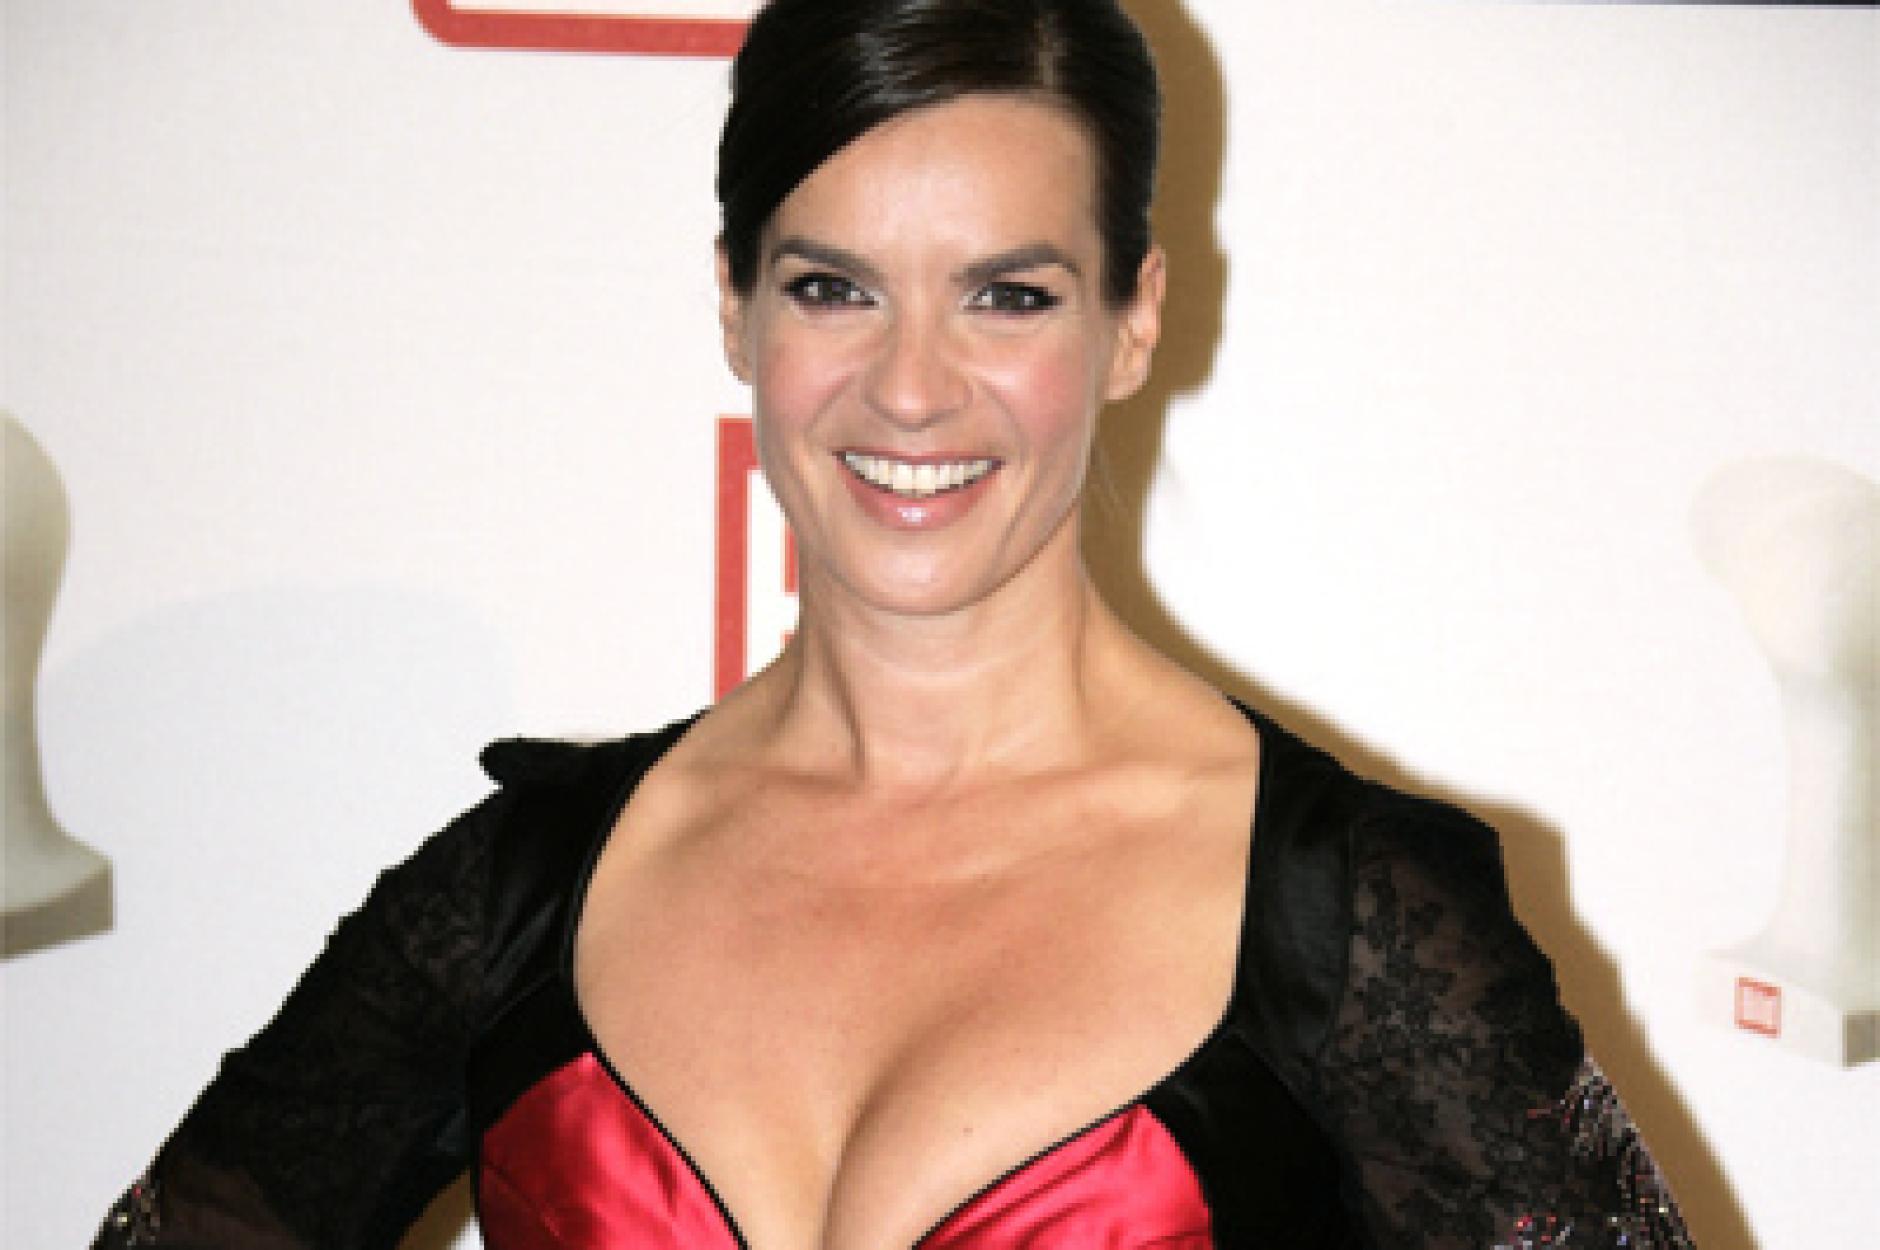 Sexy Sportlerinnen im Playboy - Promis, Kurioses, TV